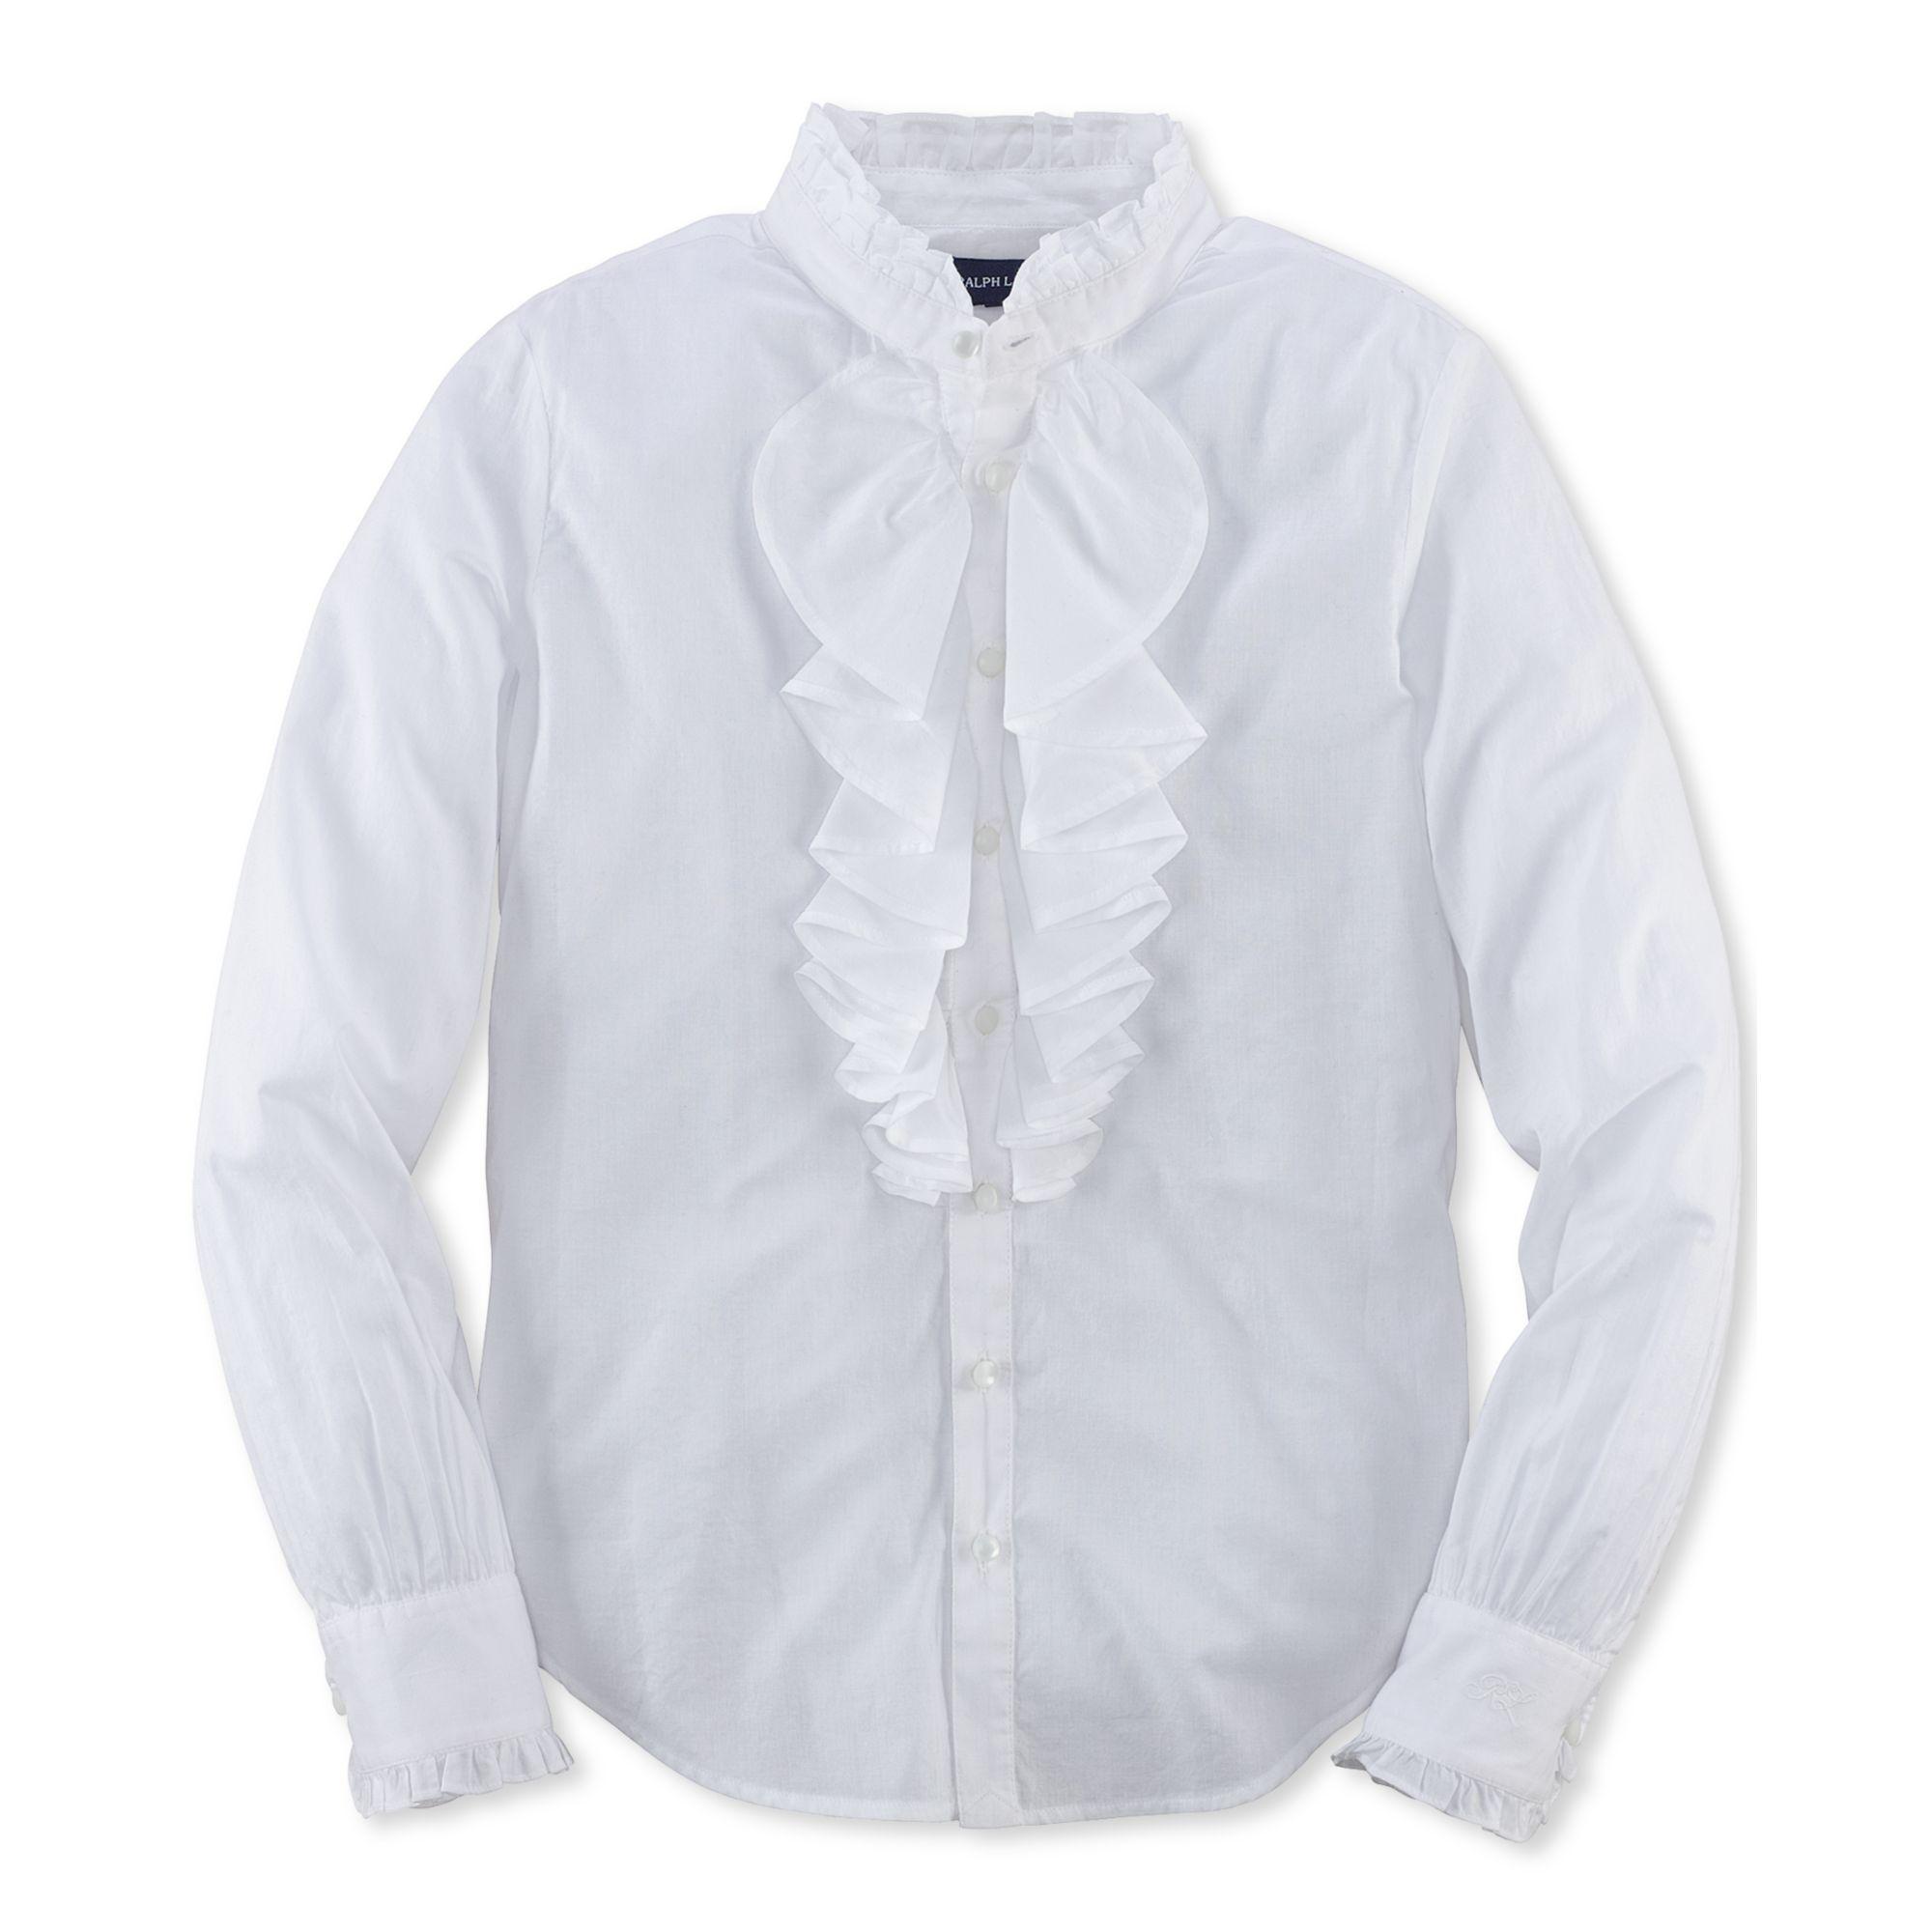 ralph lauren girls longsleeve white ruffle blouse in white lyst. Black Bedroom Furniture Sets. Home Design Ideas